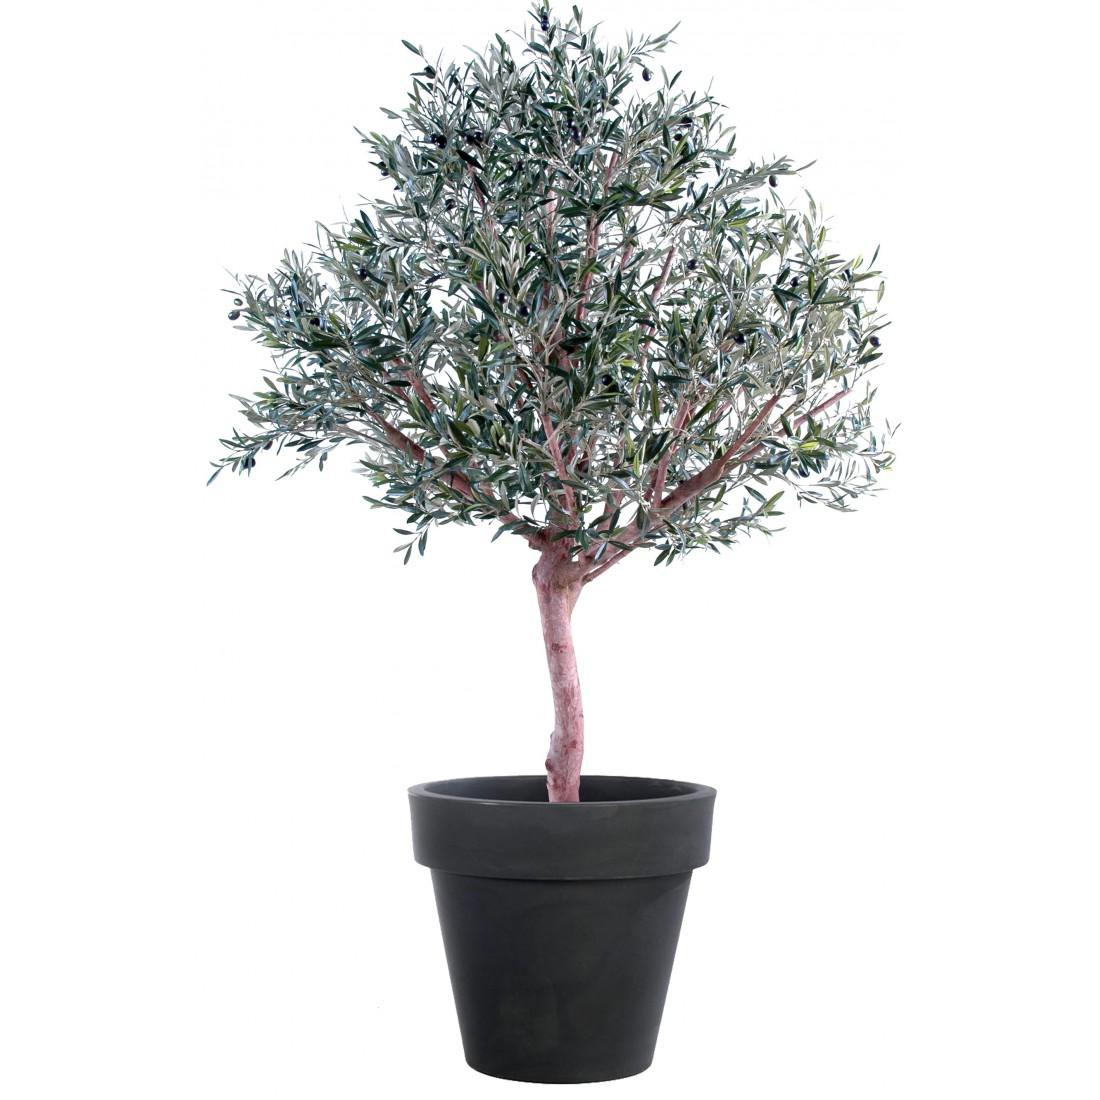 Olivier artificiel new tete large olive noire 150 for Faux olivier arbre